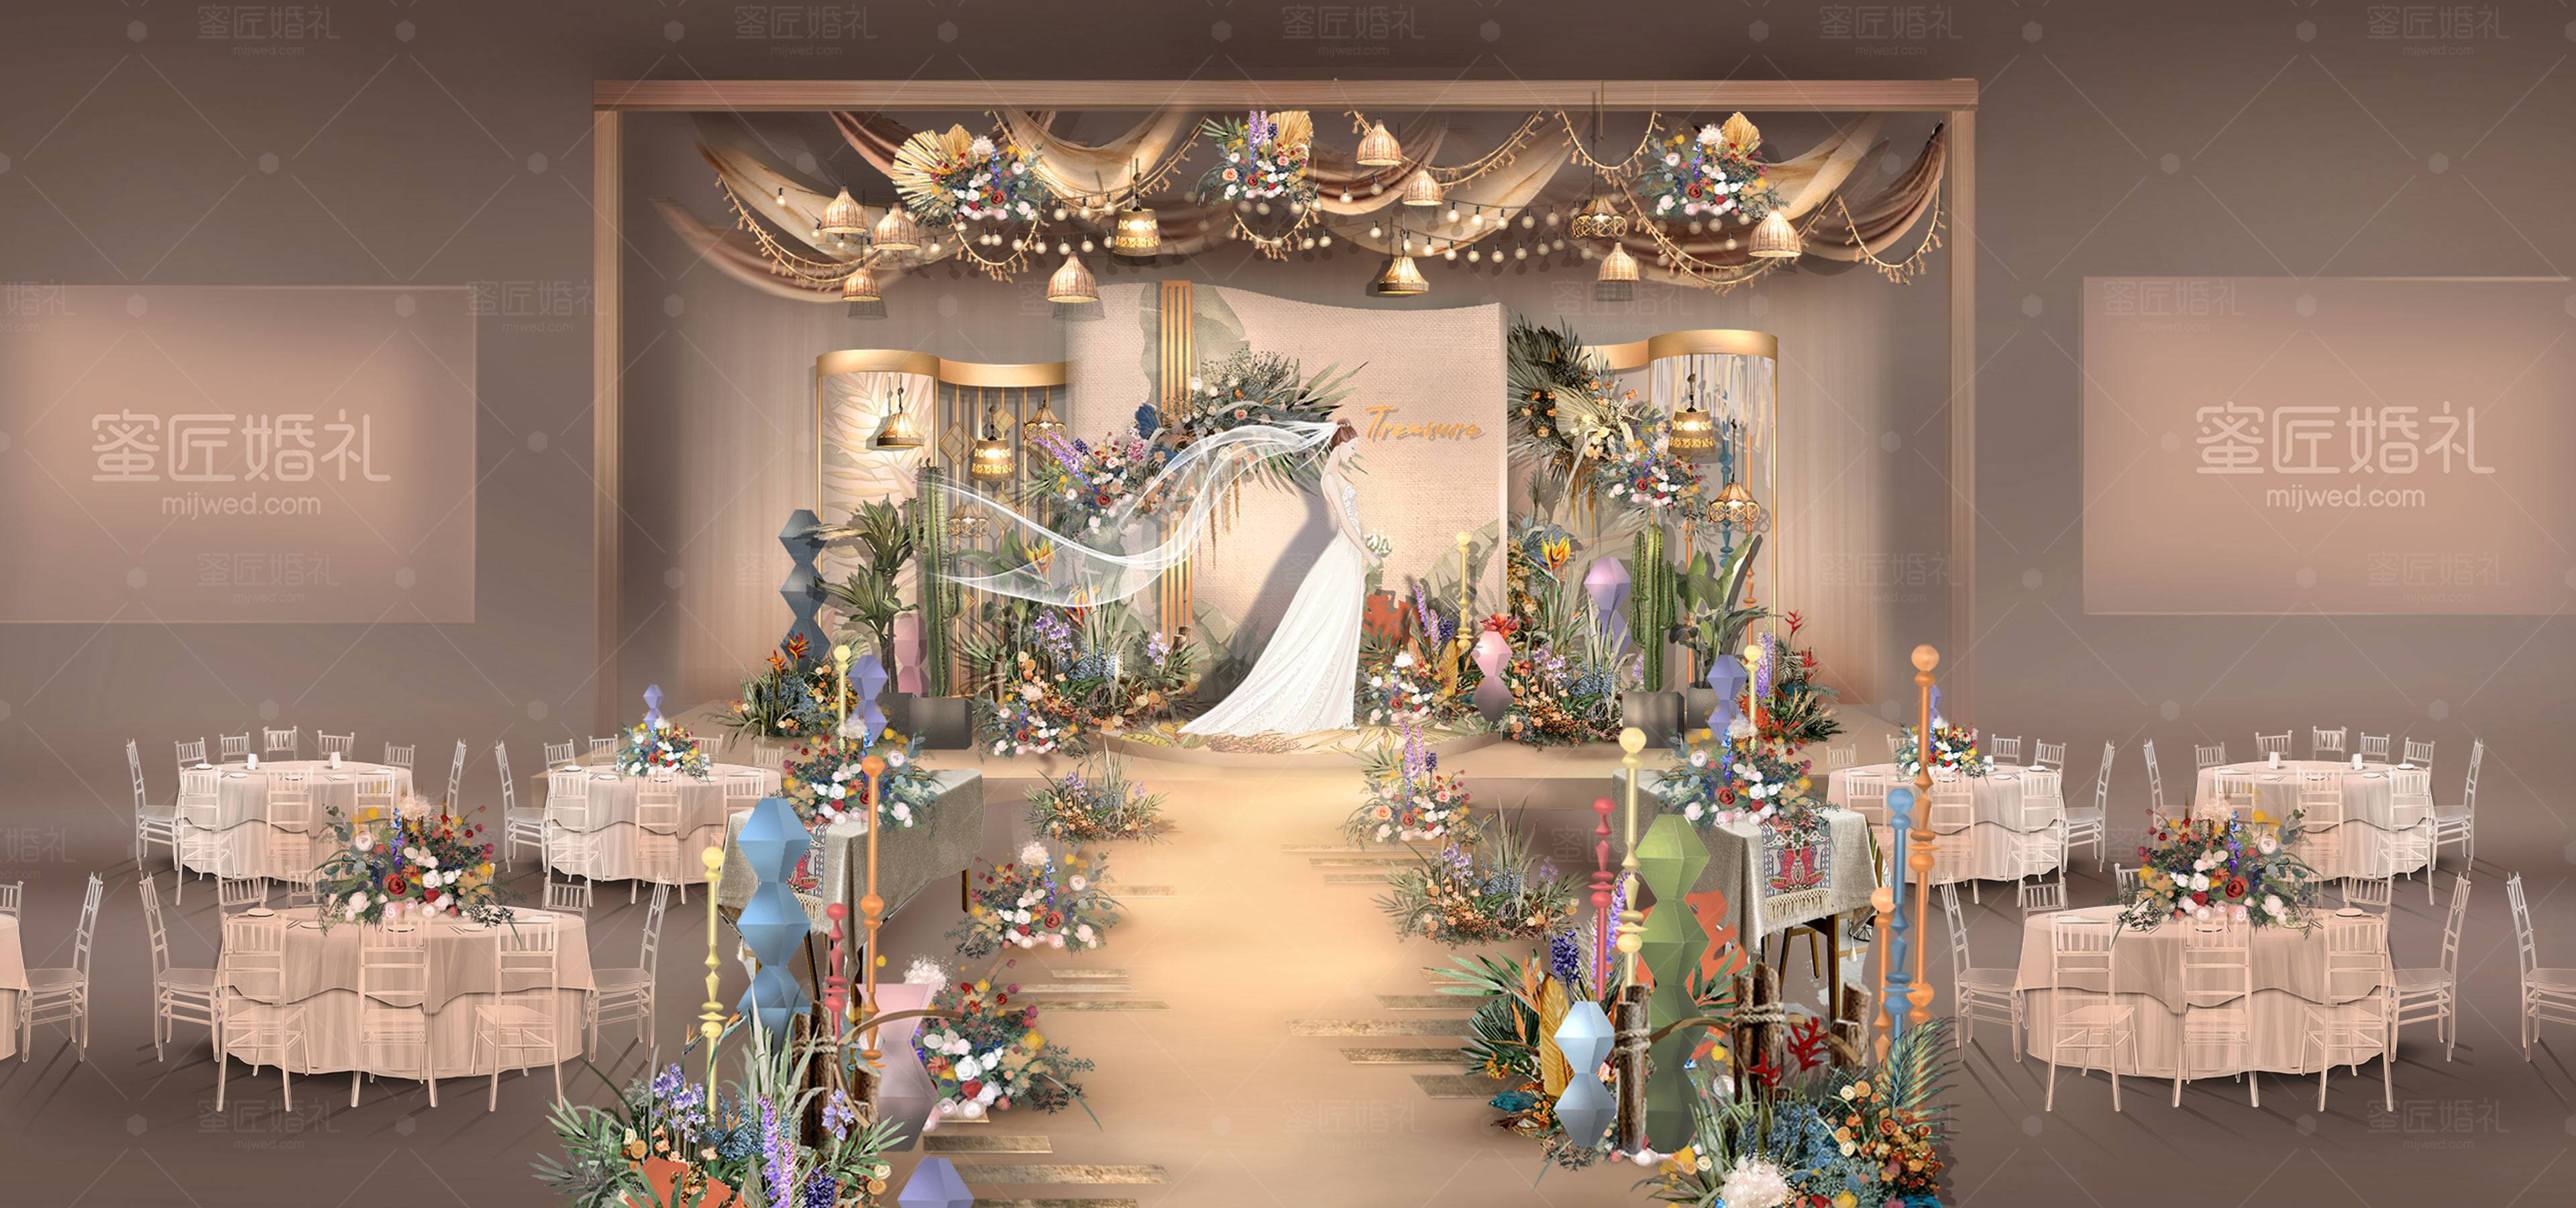 高安市婚礼策划方案:漫步哈瓦那1